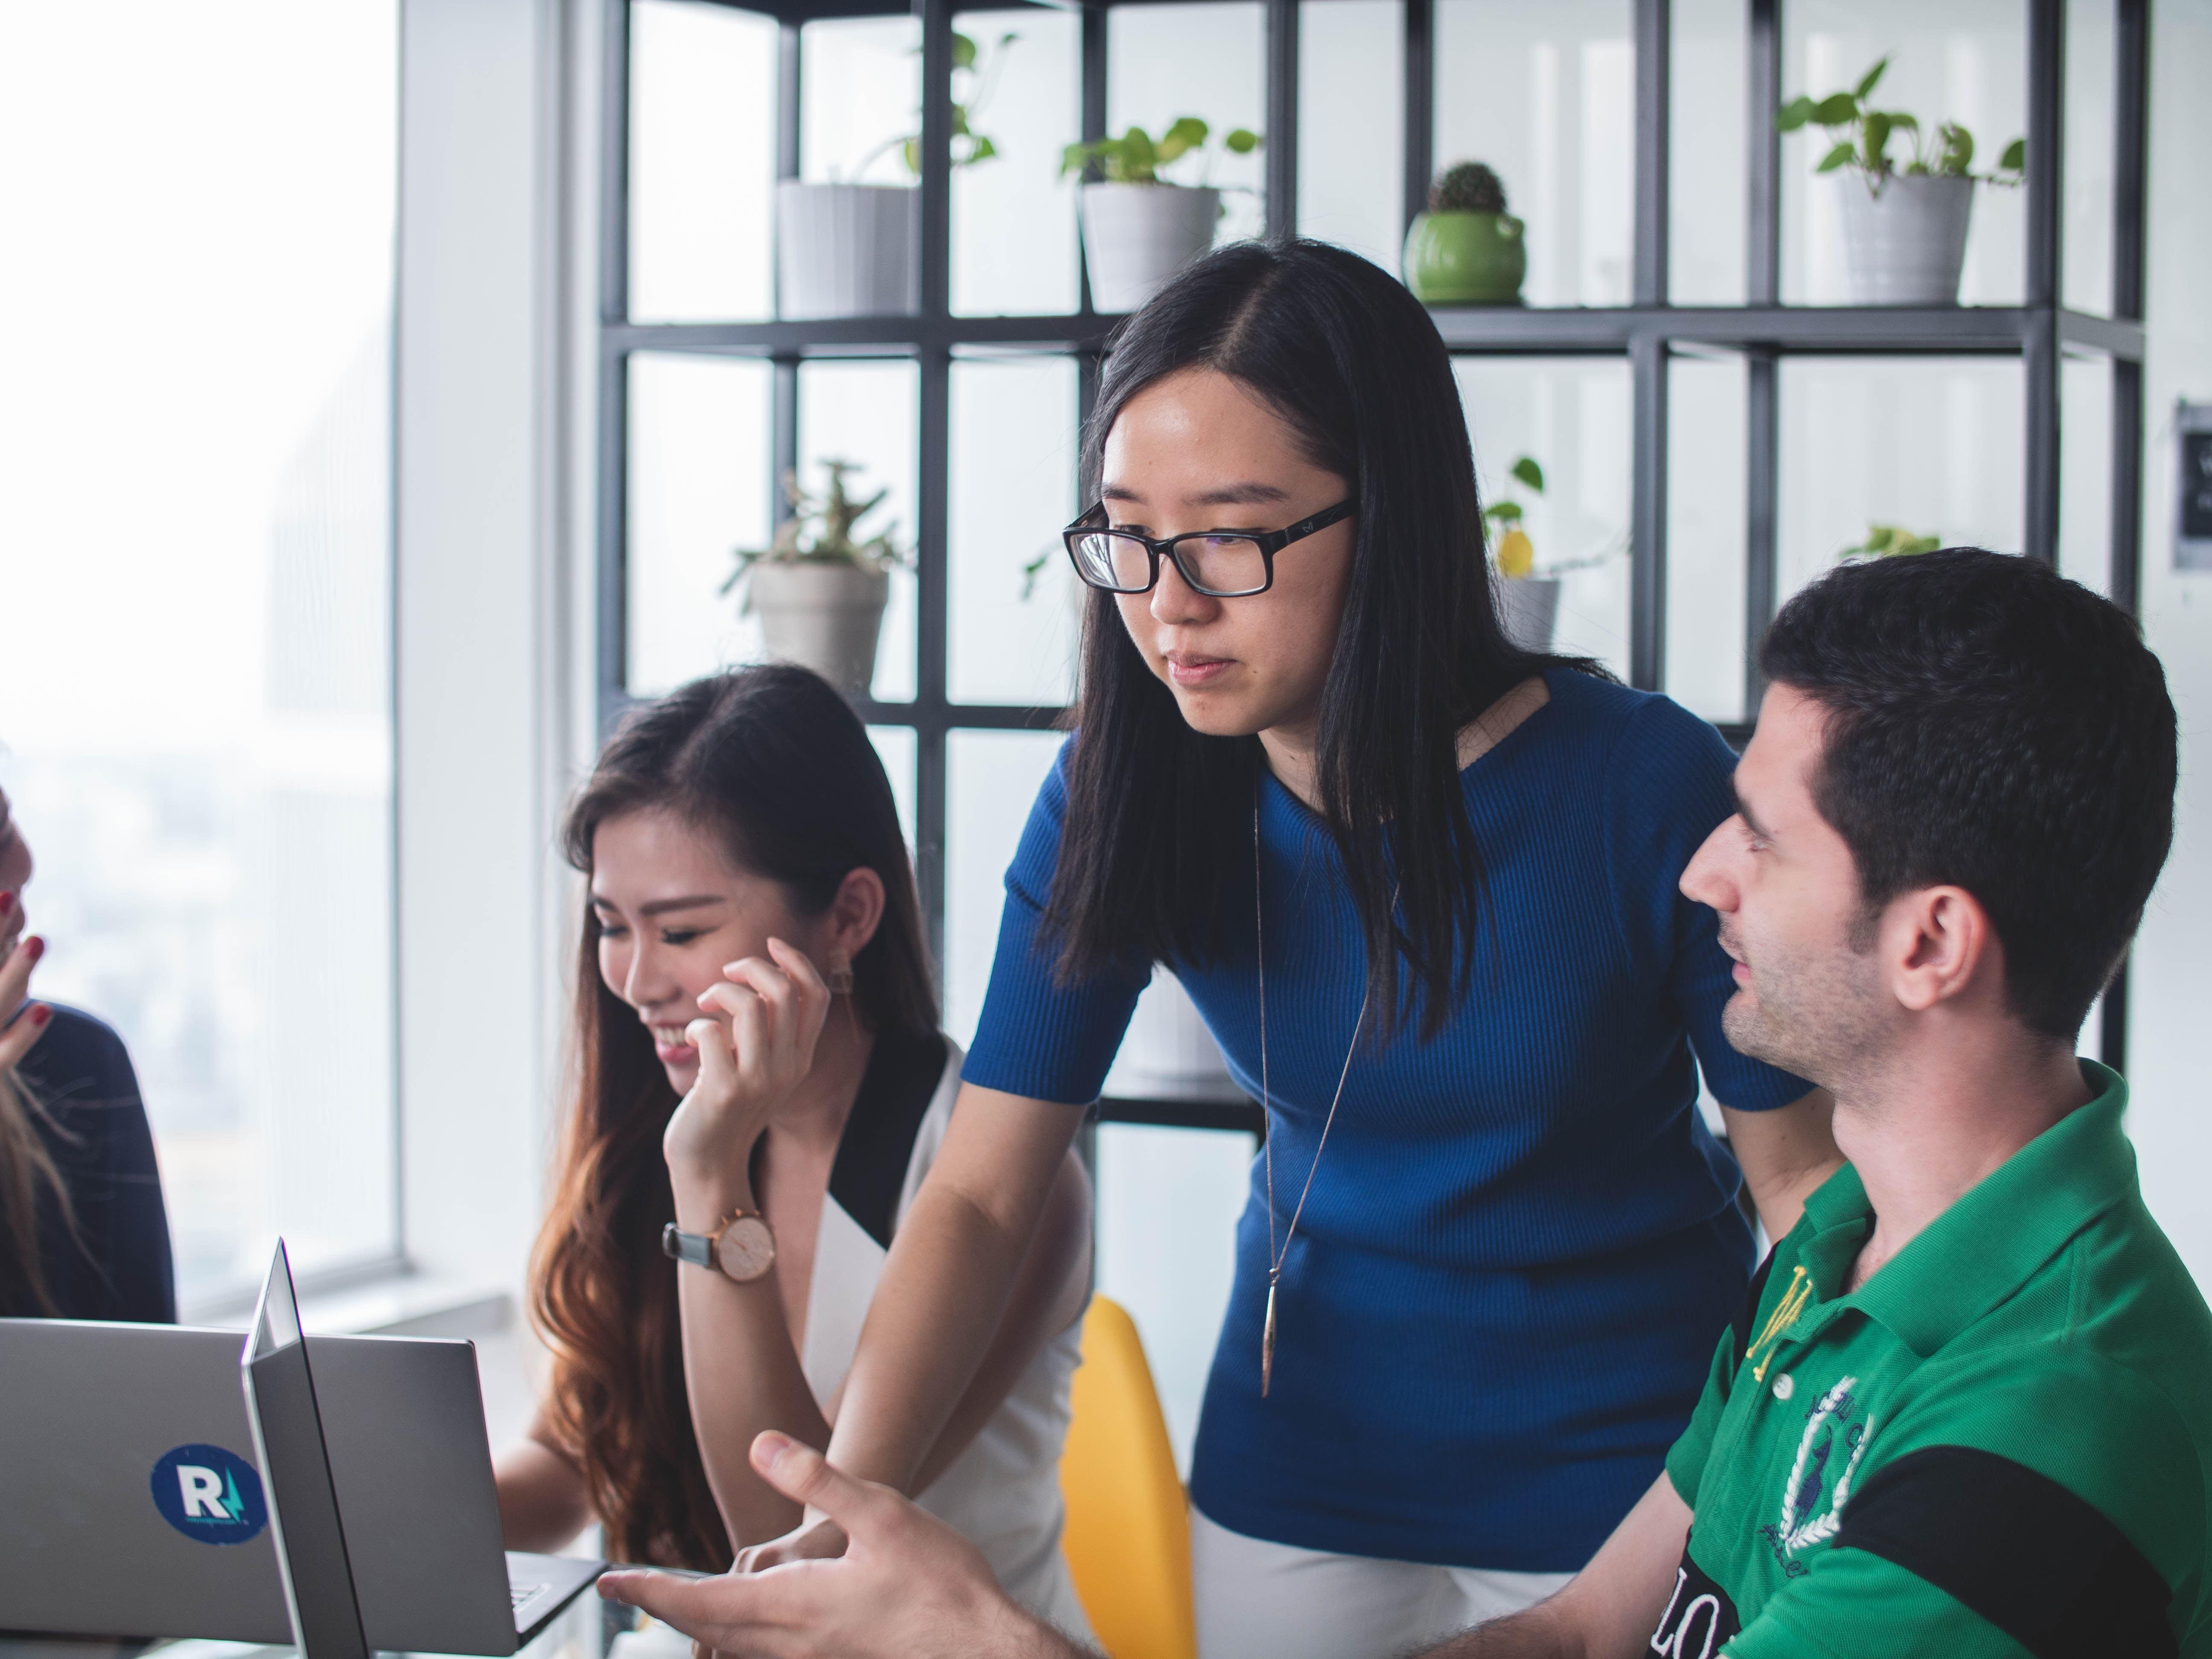 CIOs need leadership, empathy, strategic vision and communication skills.